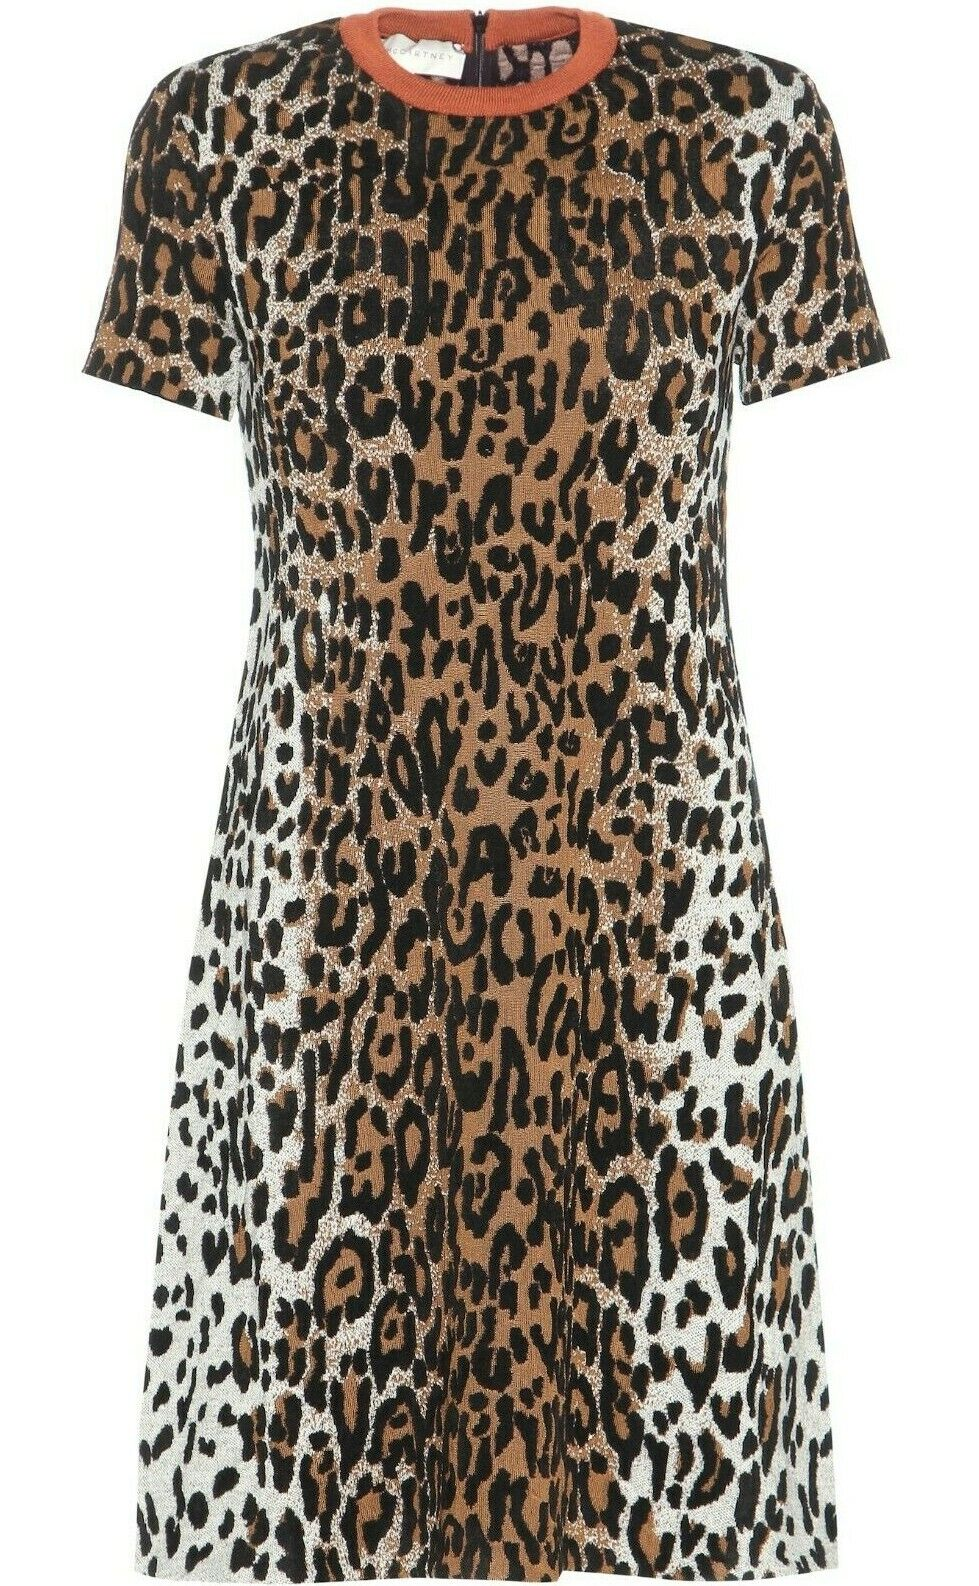 STELLA MCCARTNEY LEOPARD PRINT SHIFT DRESS IT 40